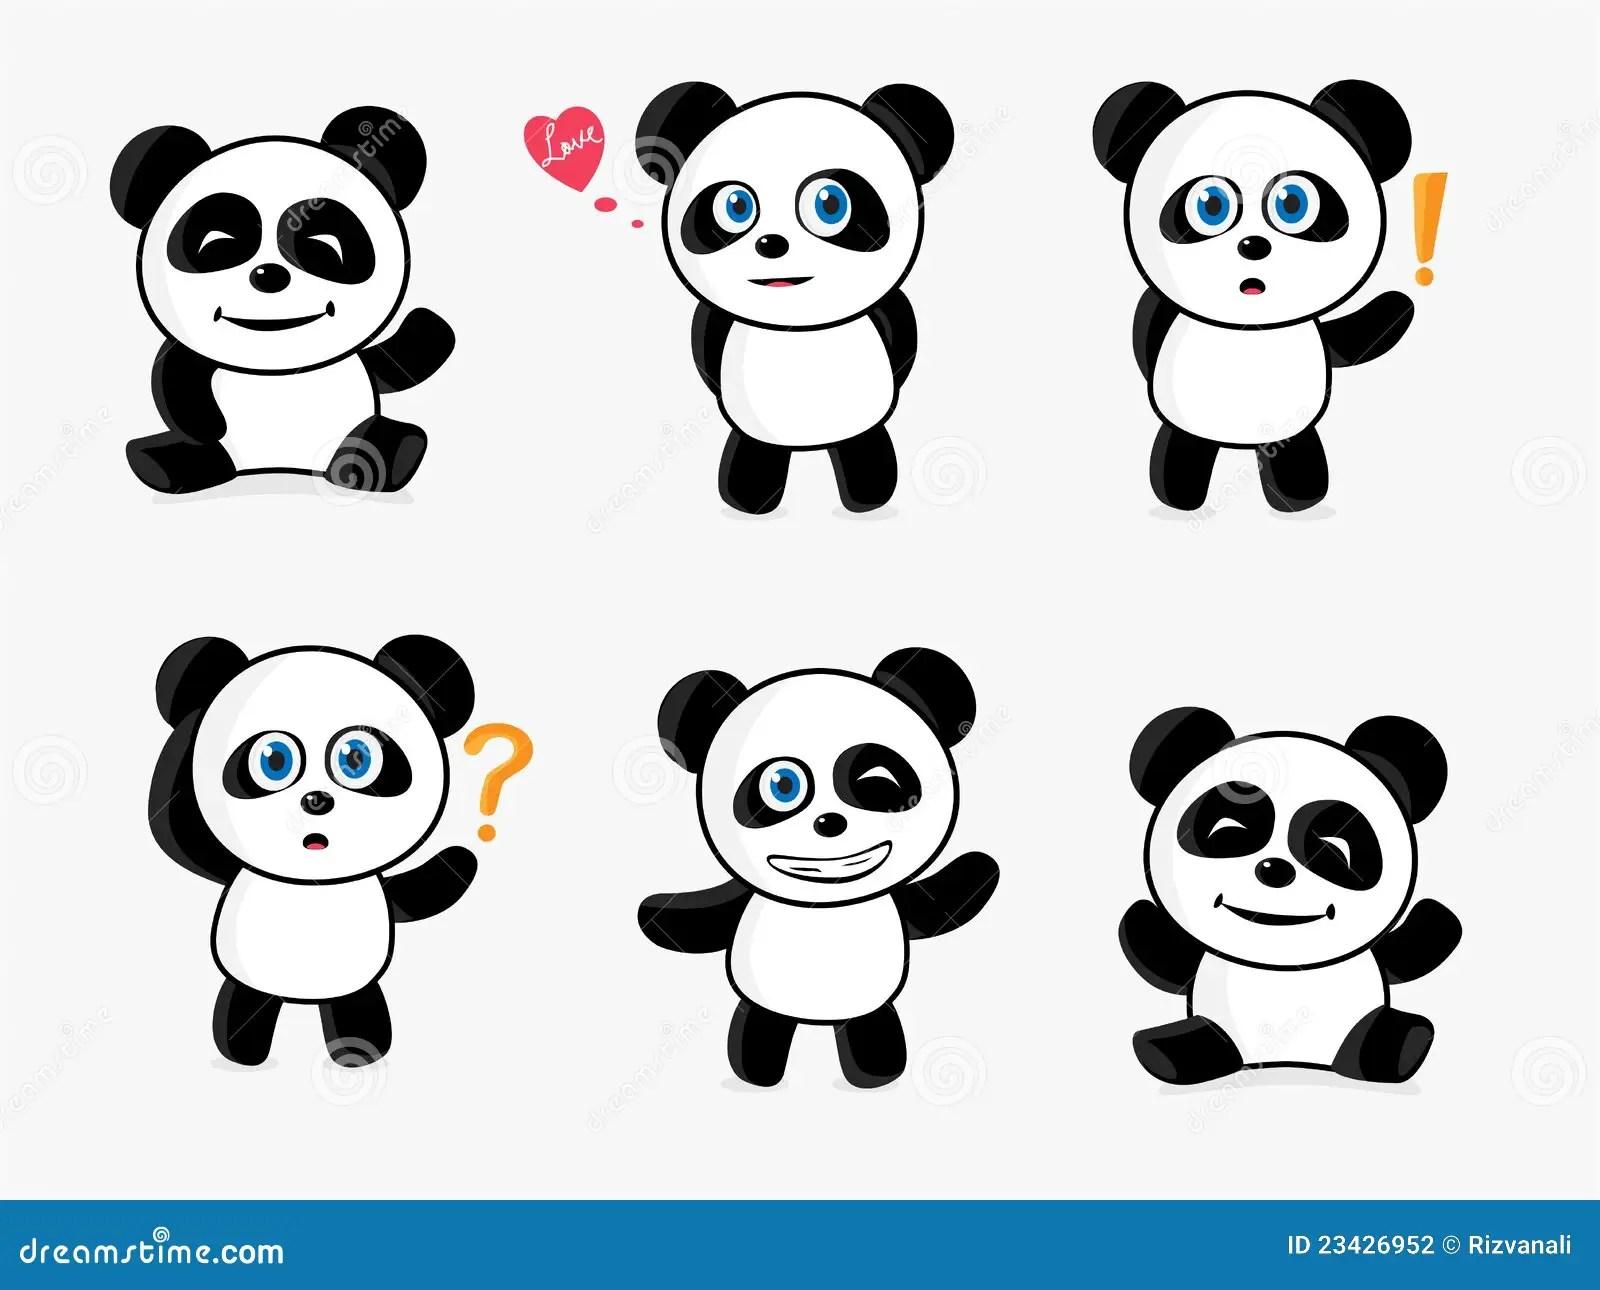 Cute Panda Vector Illustration